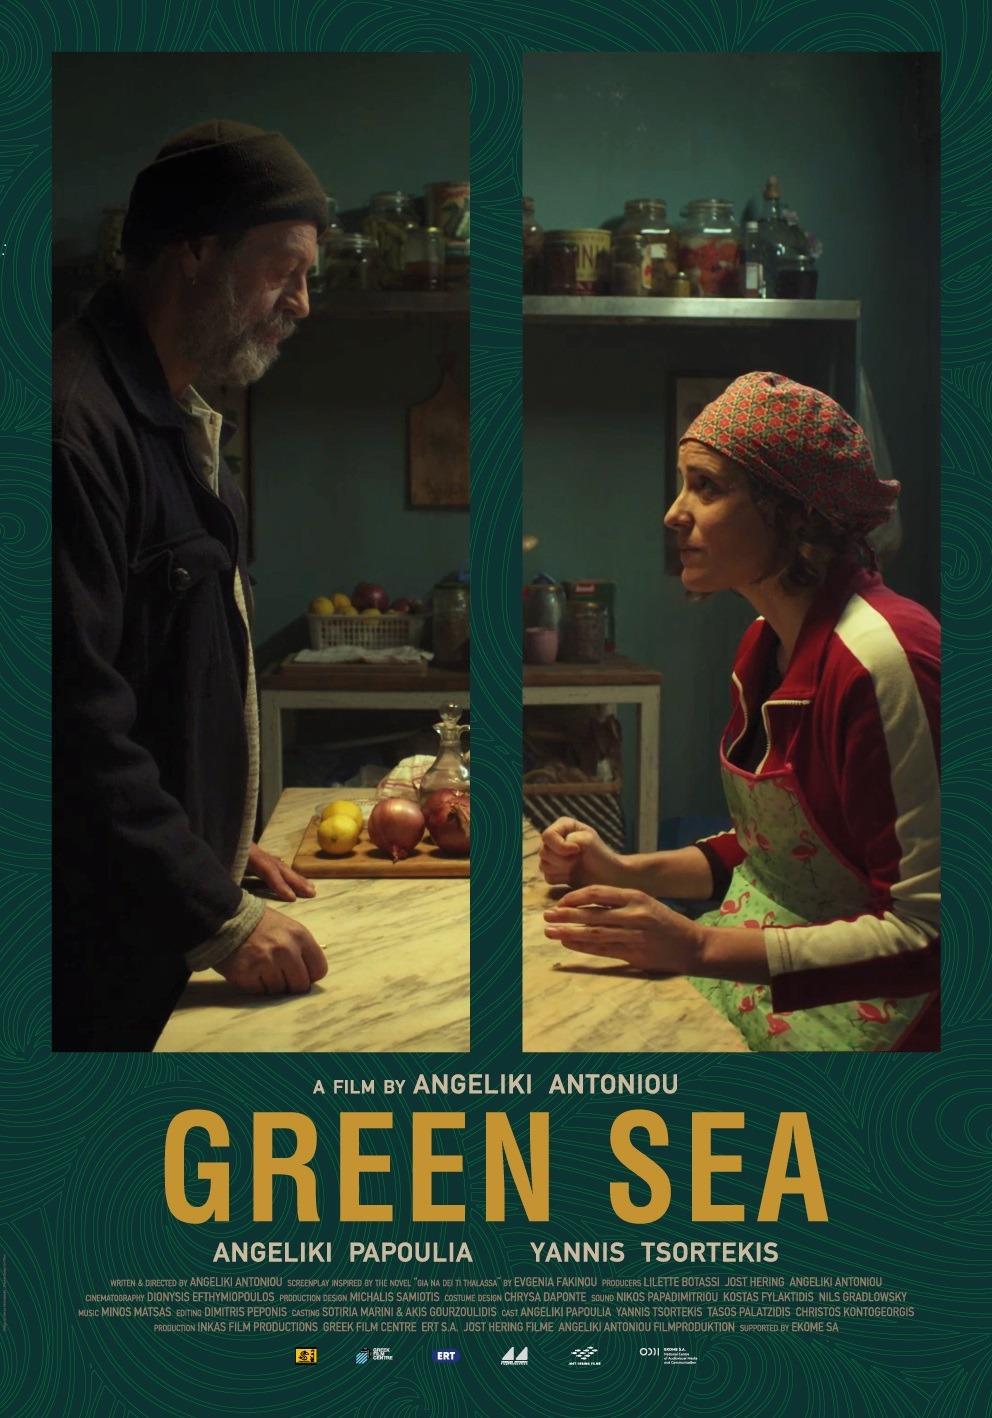 GreenSea Digital Poster final